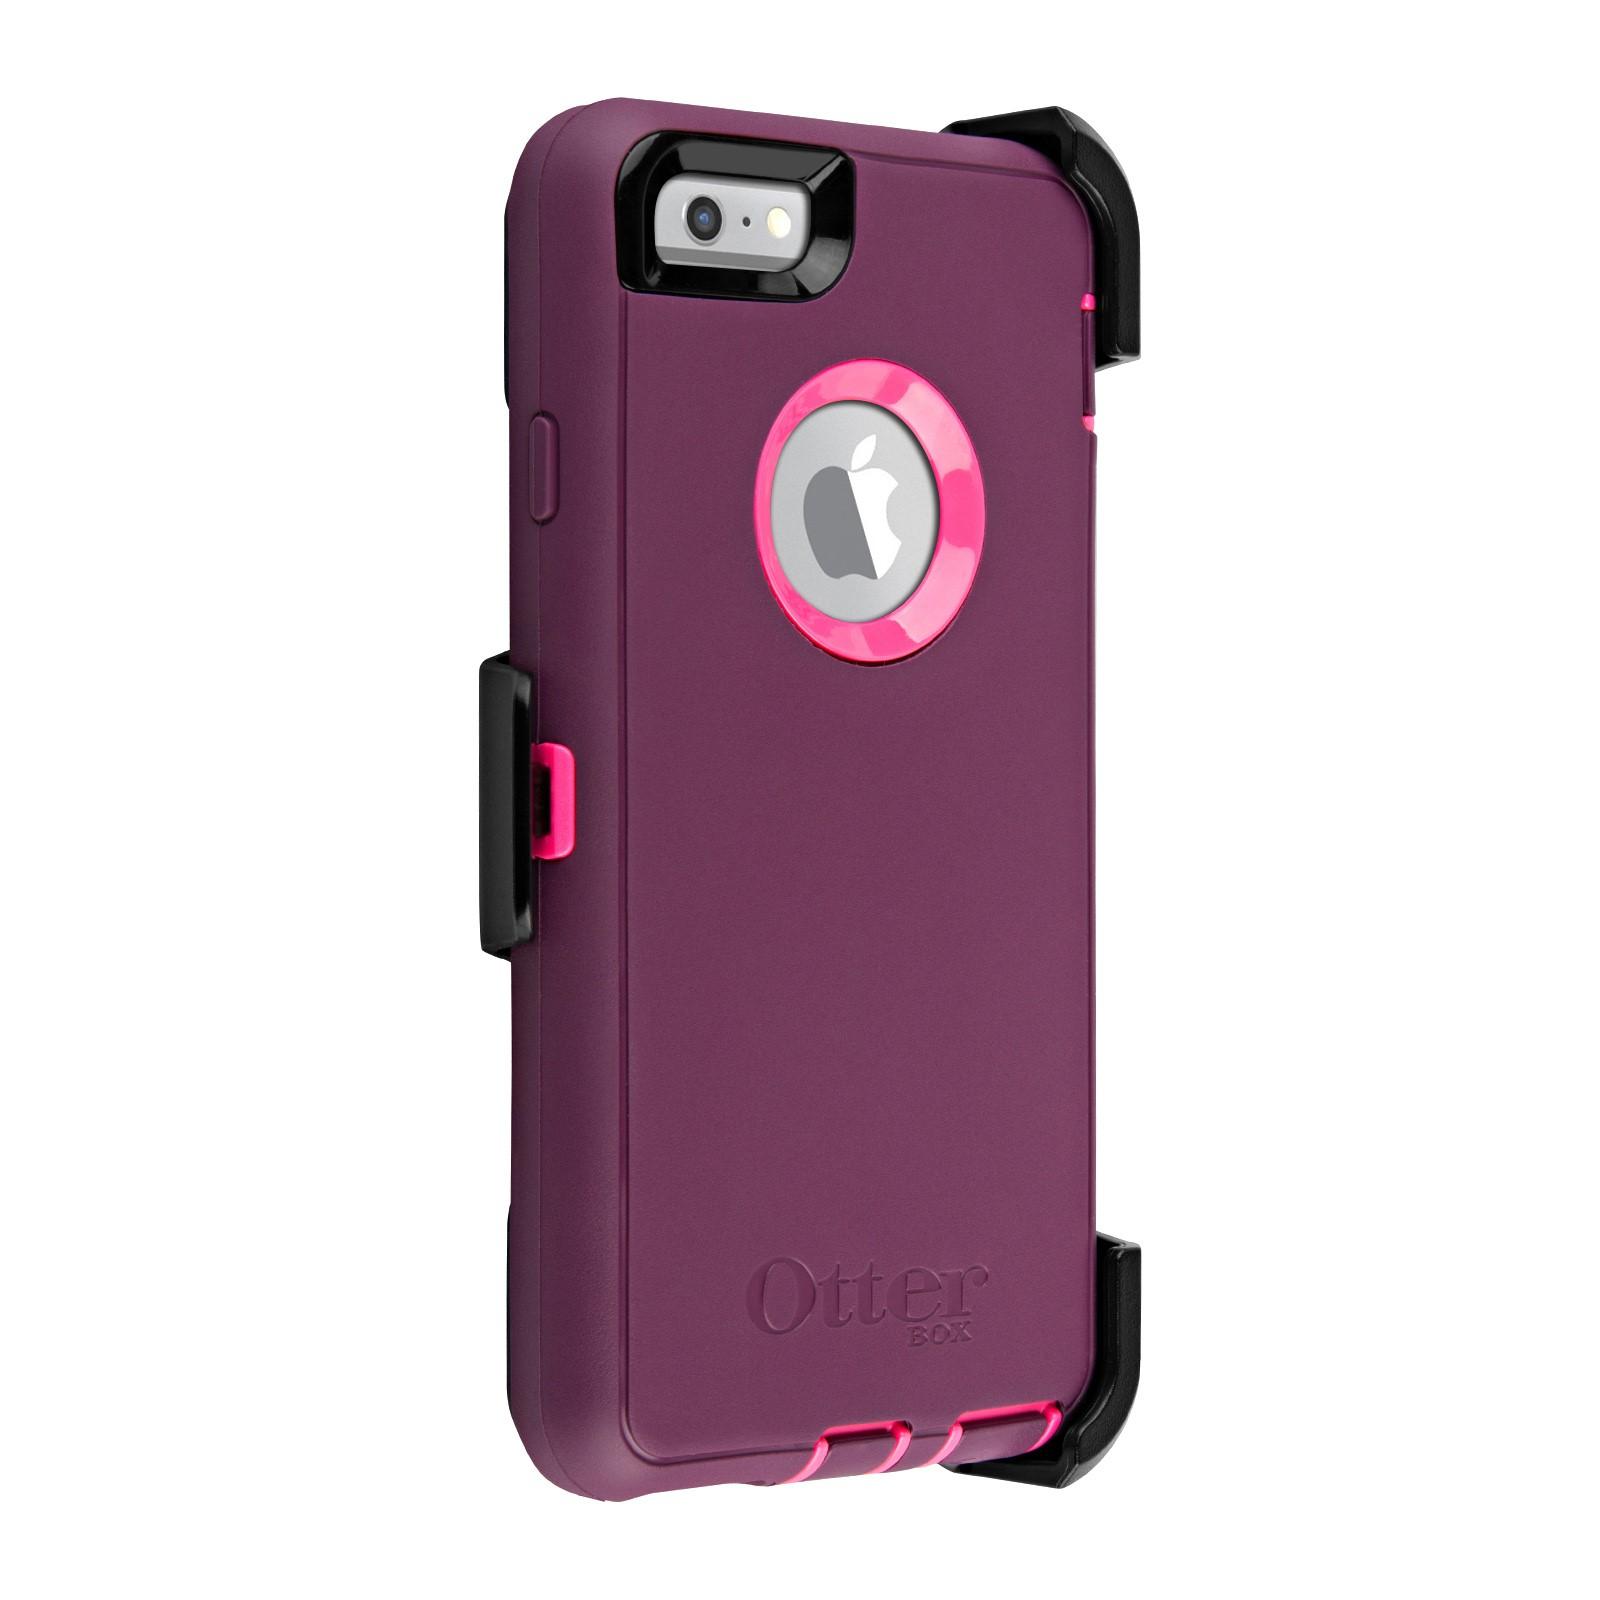 Apple Otterbox Iphone